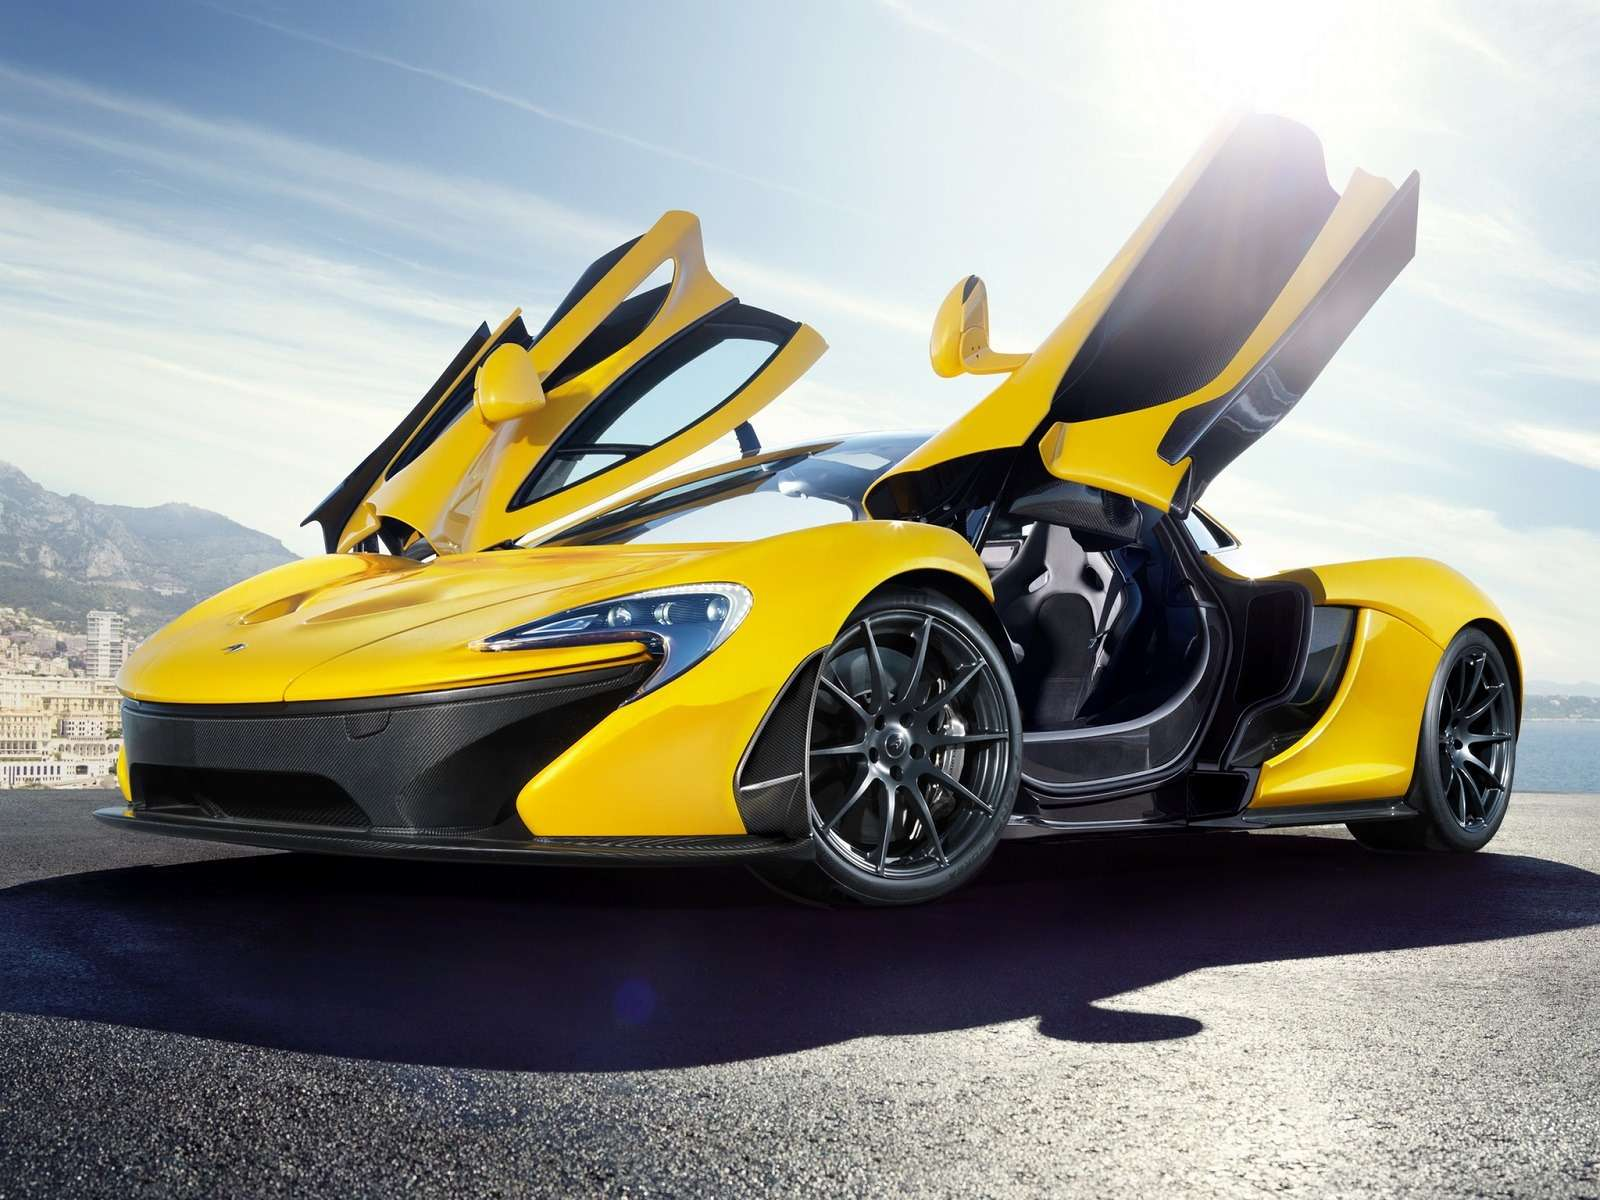 Владелец суперкара McLaren вСША попал вДТП сразу после покупки— фото 362621